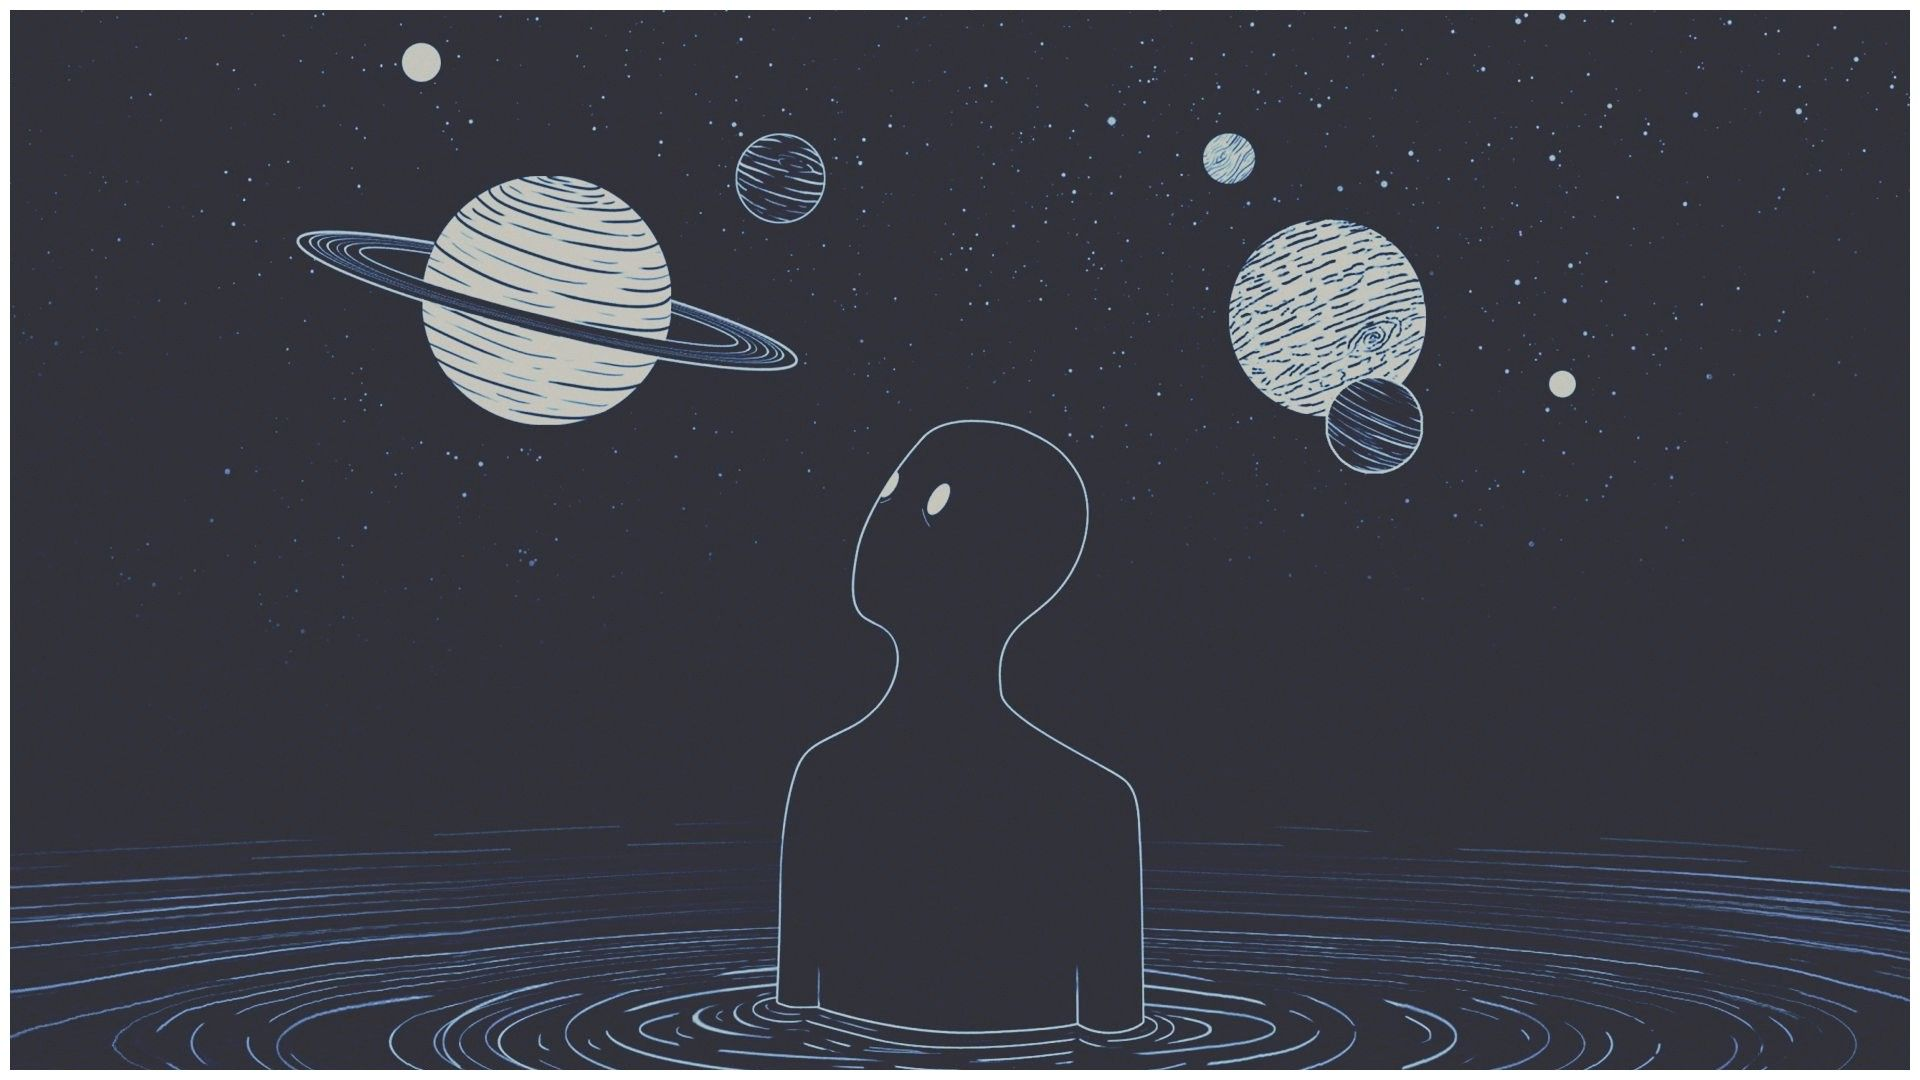 Aesthetic Space Desktop Wallpapers - Wallpaper Cave